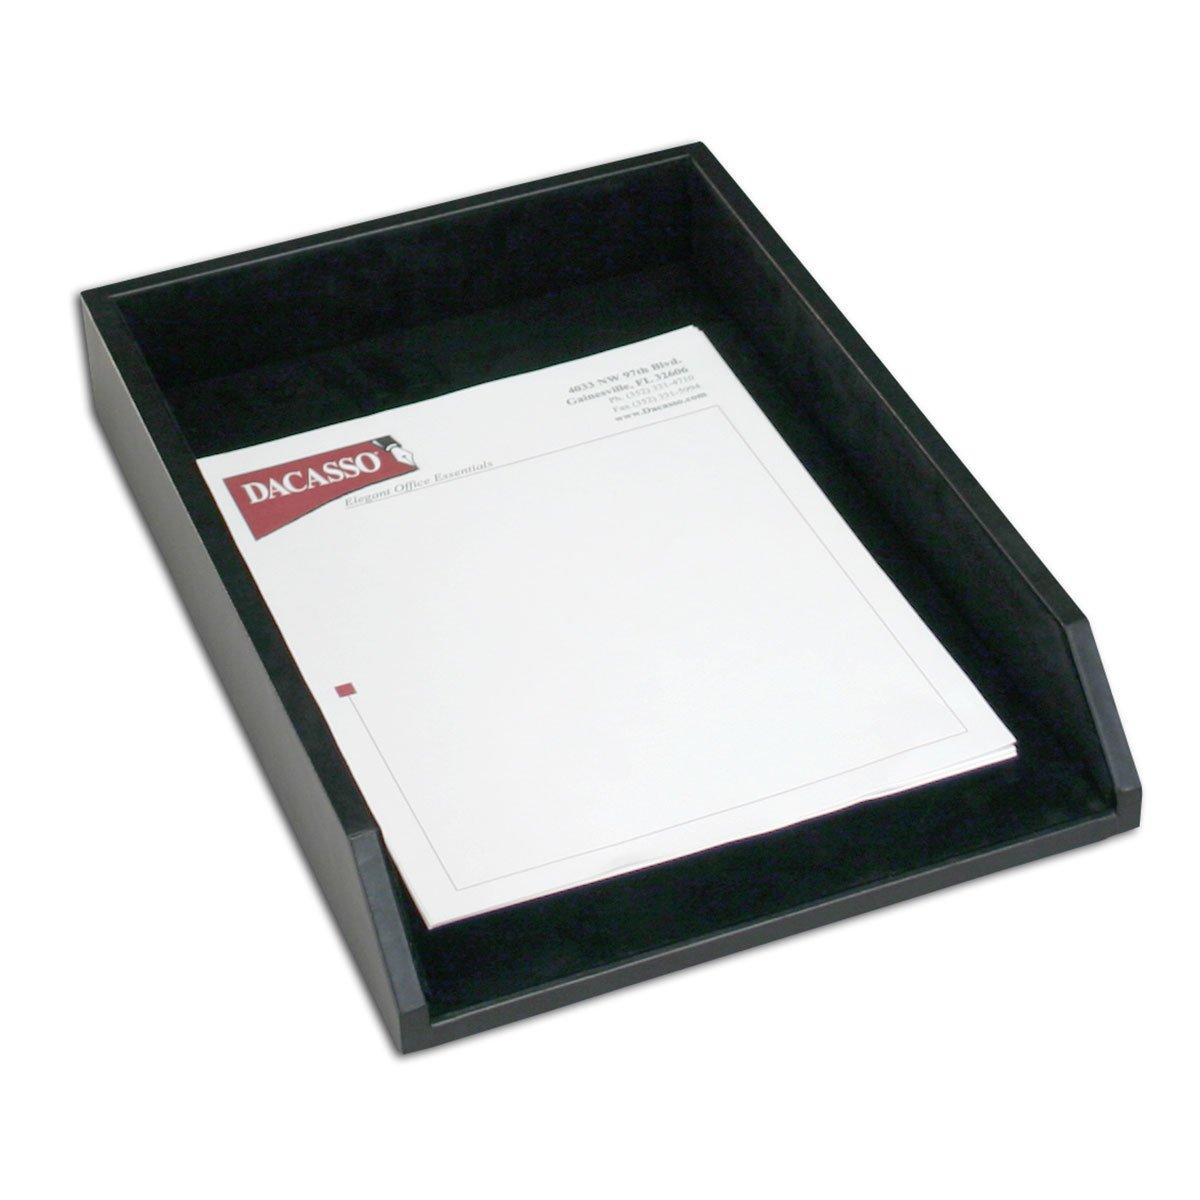 Dacasso Leather Desk Set, 8-Piece, Black by Dacasso (Image #3)